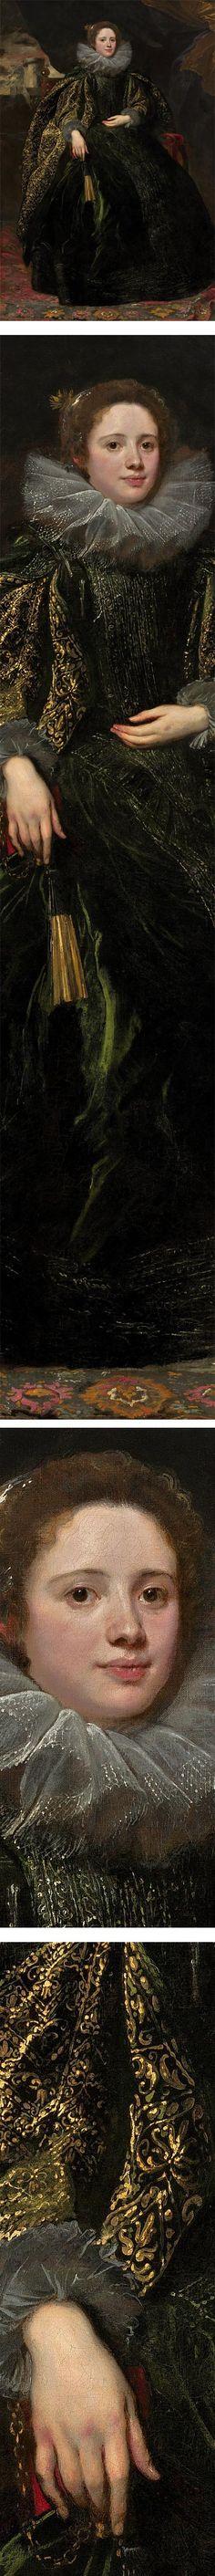 VAN DYCK Sir Antoon van Dyck - Flemish (Antwerpen 1599-1641 Londen) ~ Marchesa Balbi